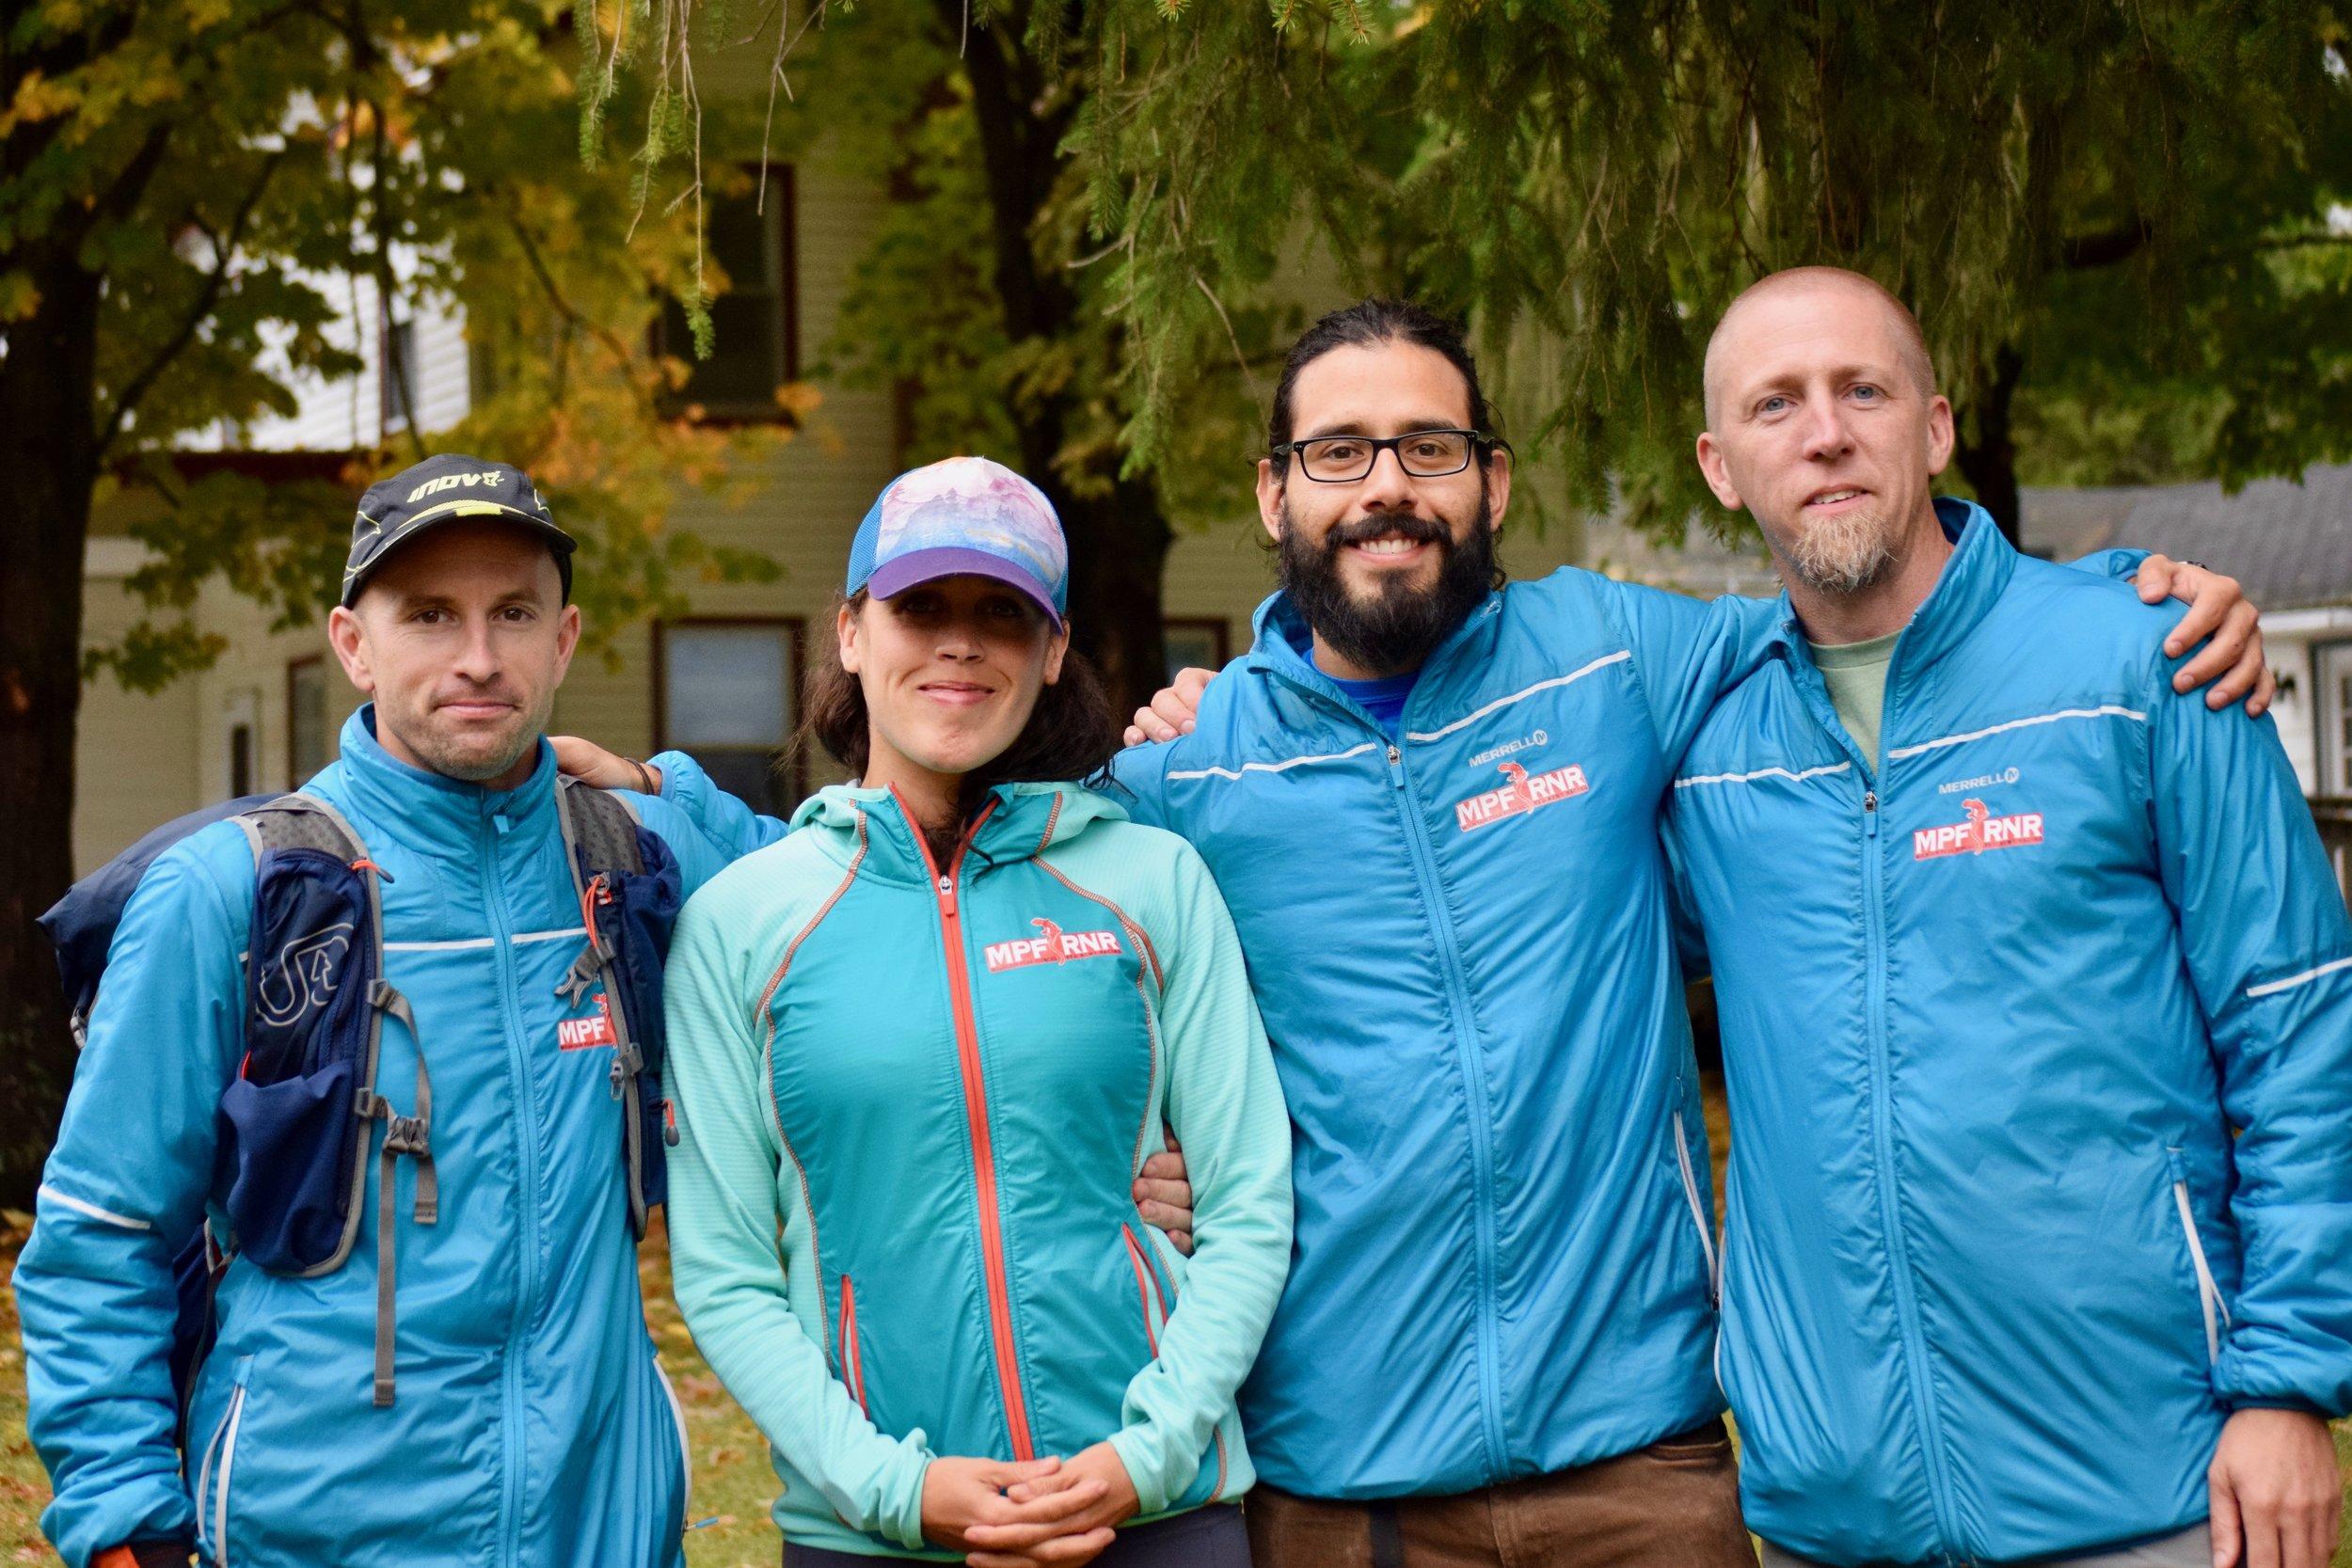 Photo: Tara Siudy - With MPF RNR Teammates Elizabeth, Jay & Mike!